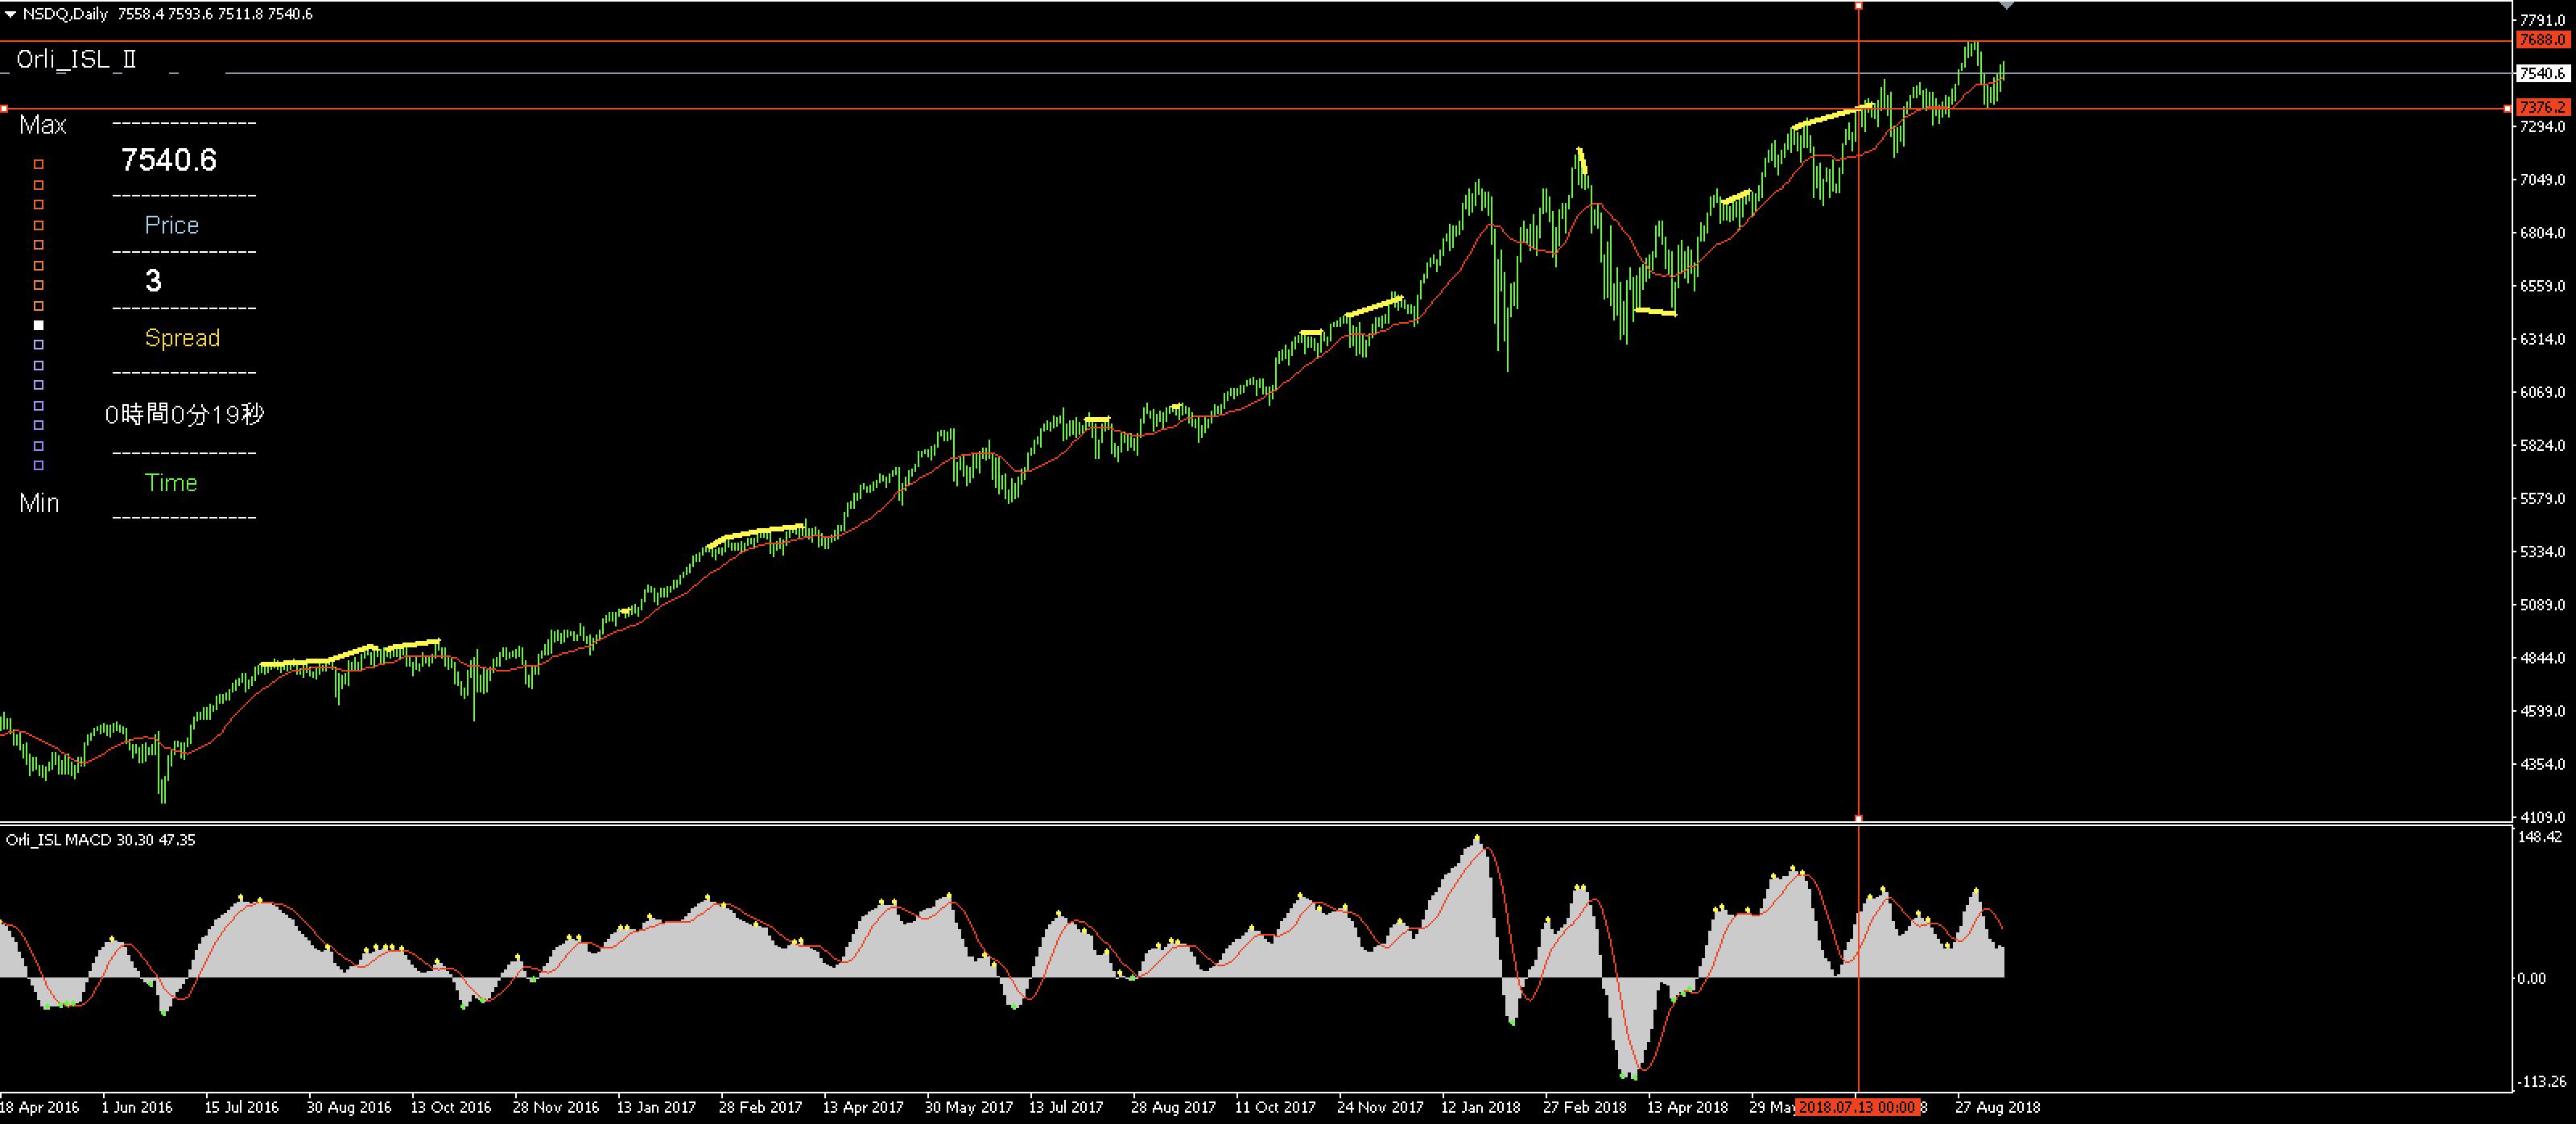 nsdq_chart.png